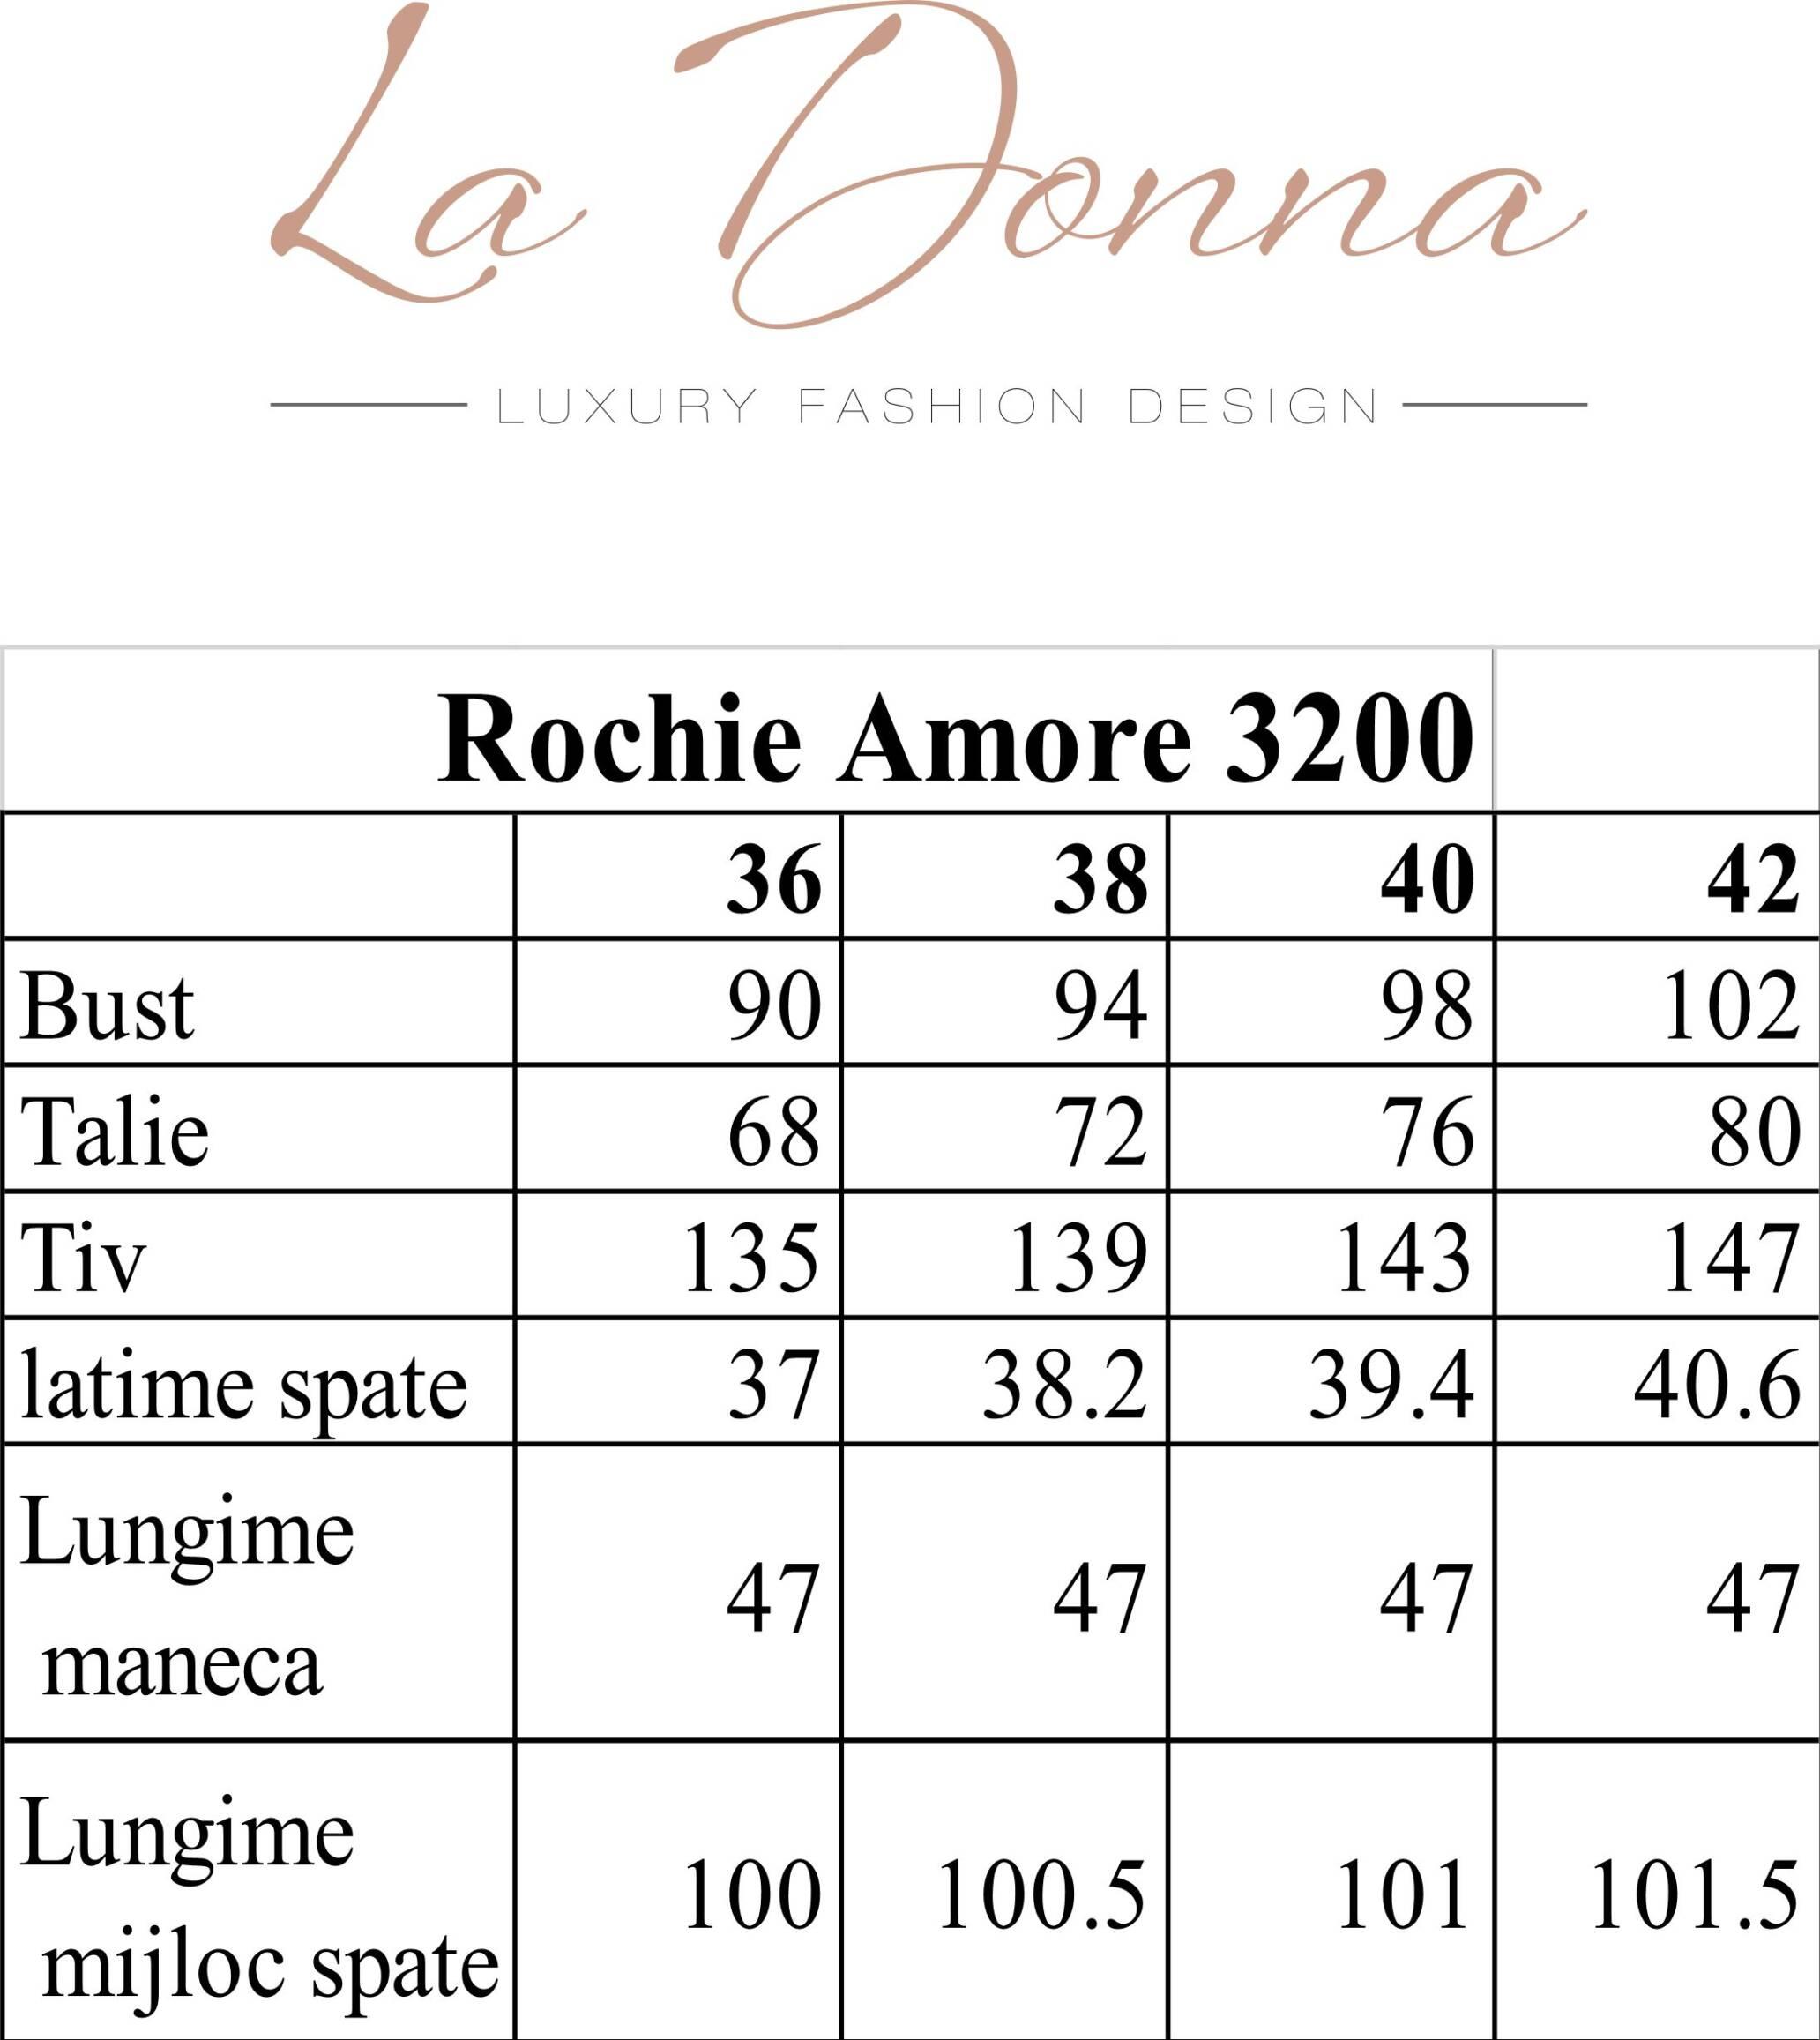 rochie amore 3200